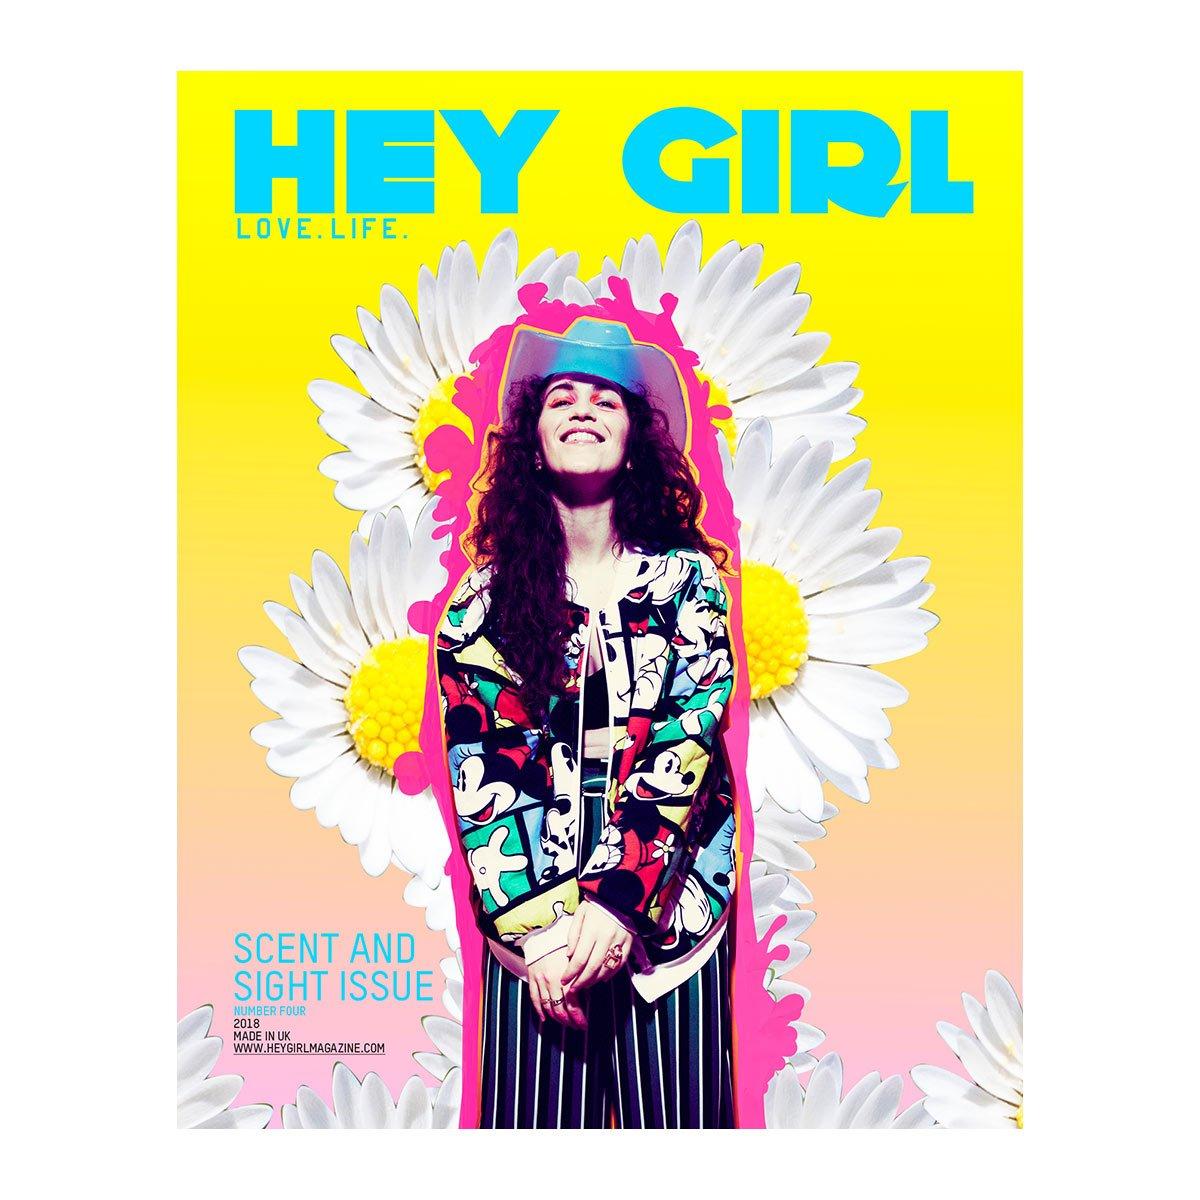 hey girl magazine cover